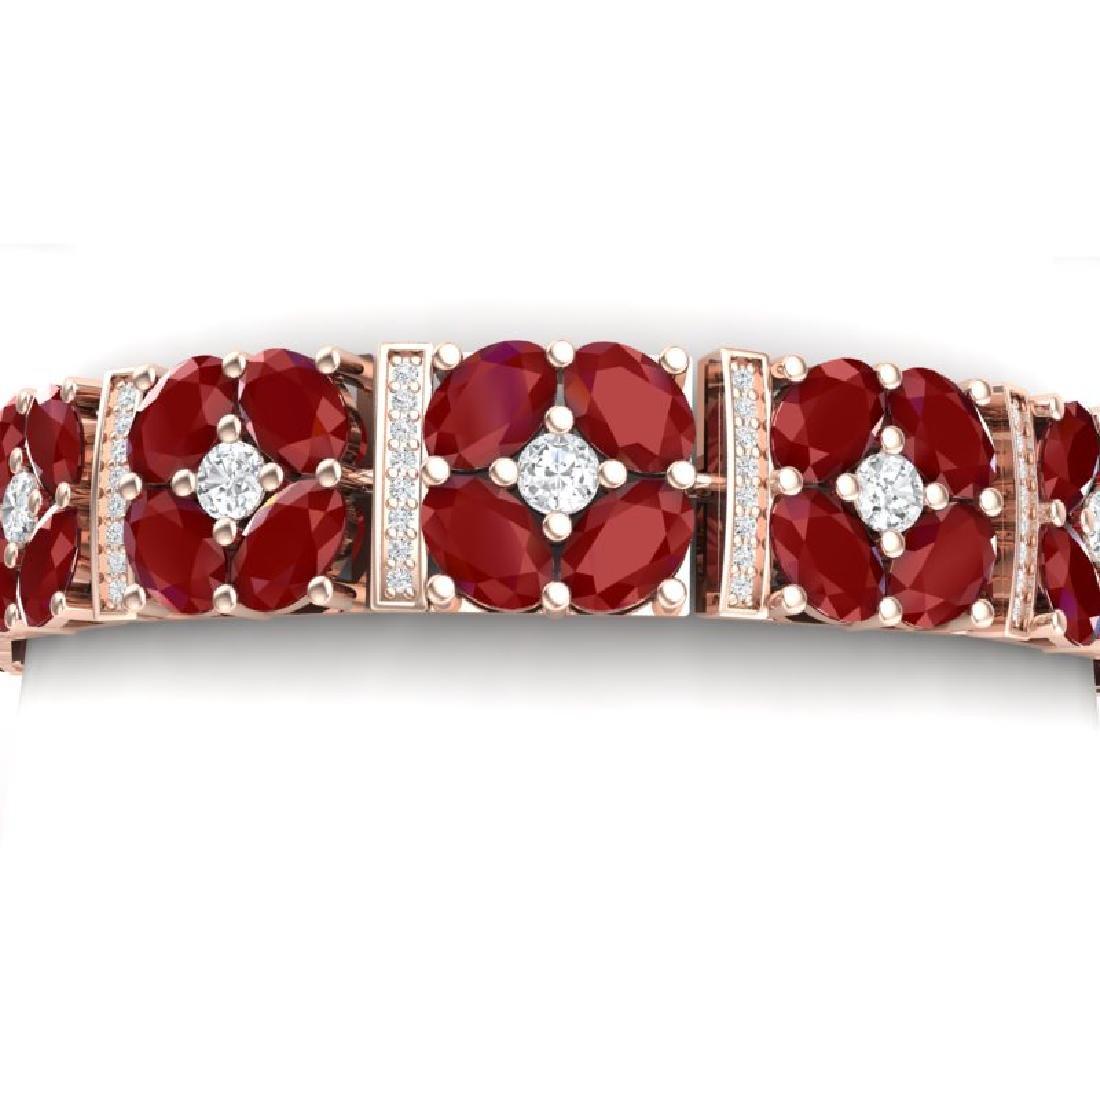 48.04 CTW Royalty Ruby & VS Diamond Bracelet 18K Rose